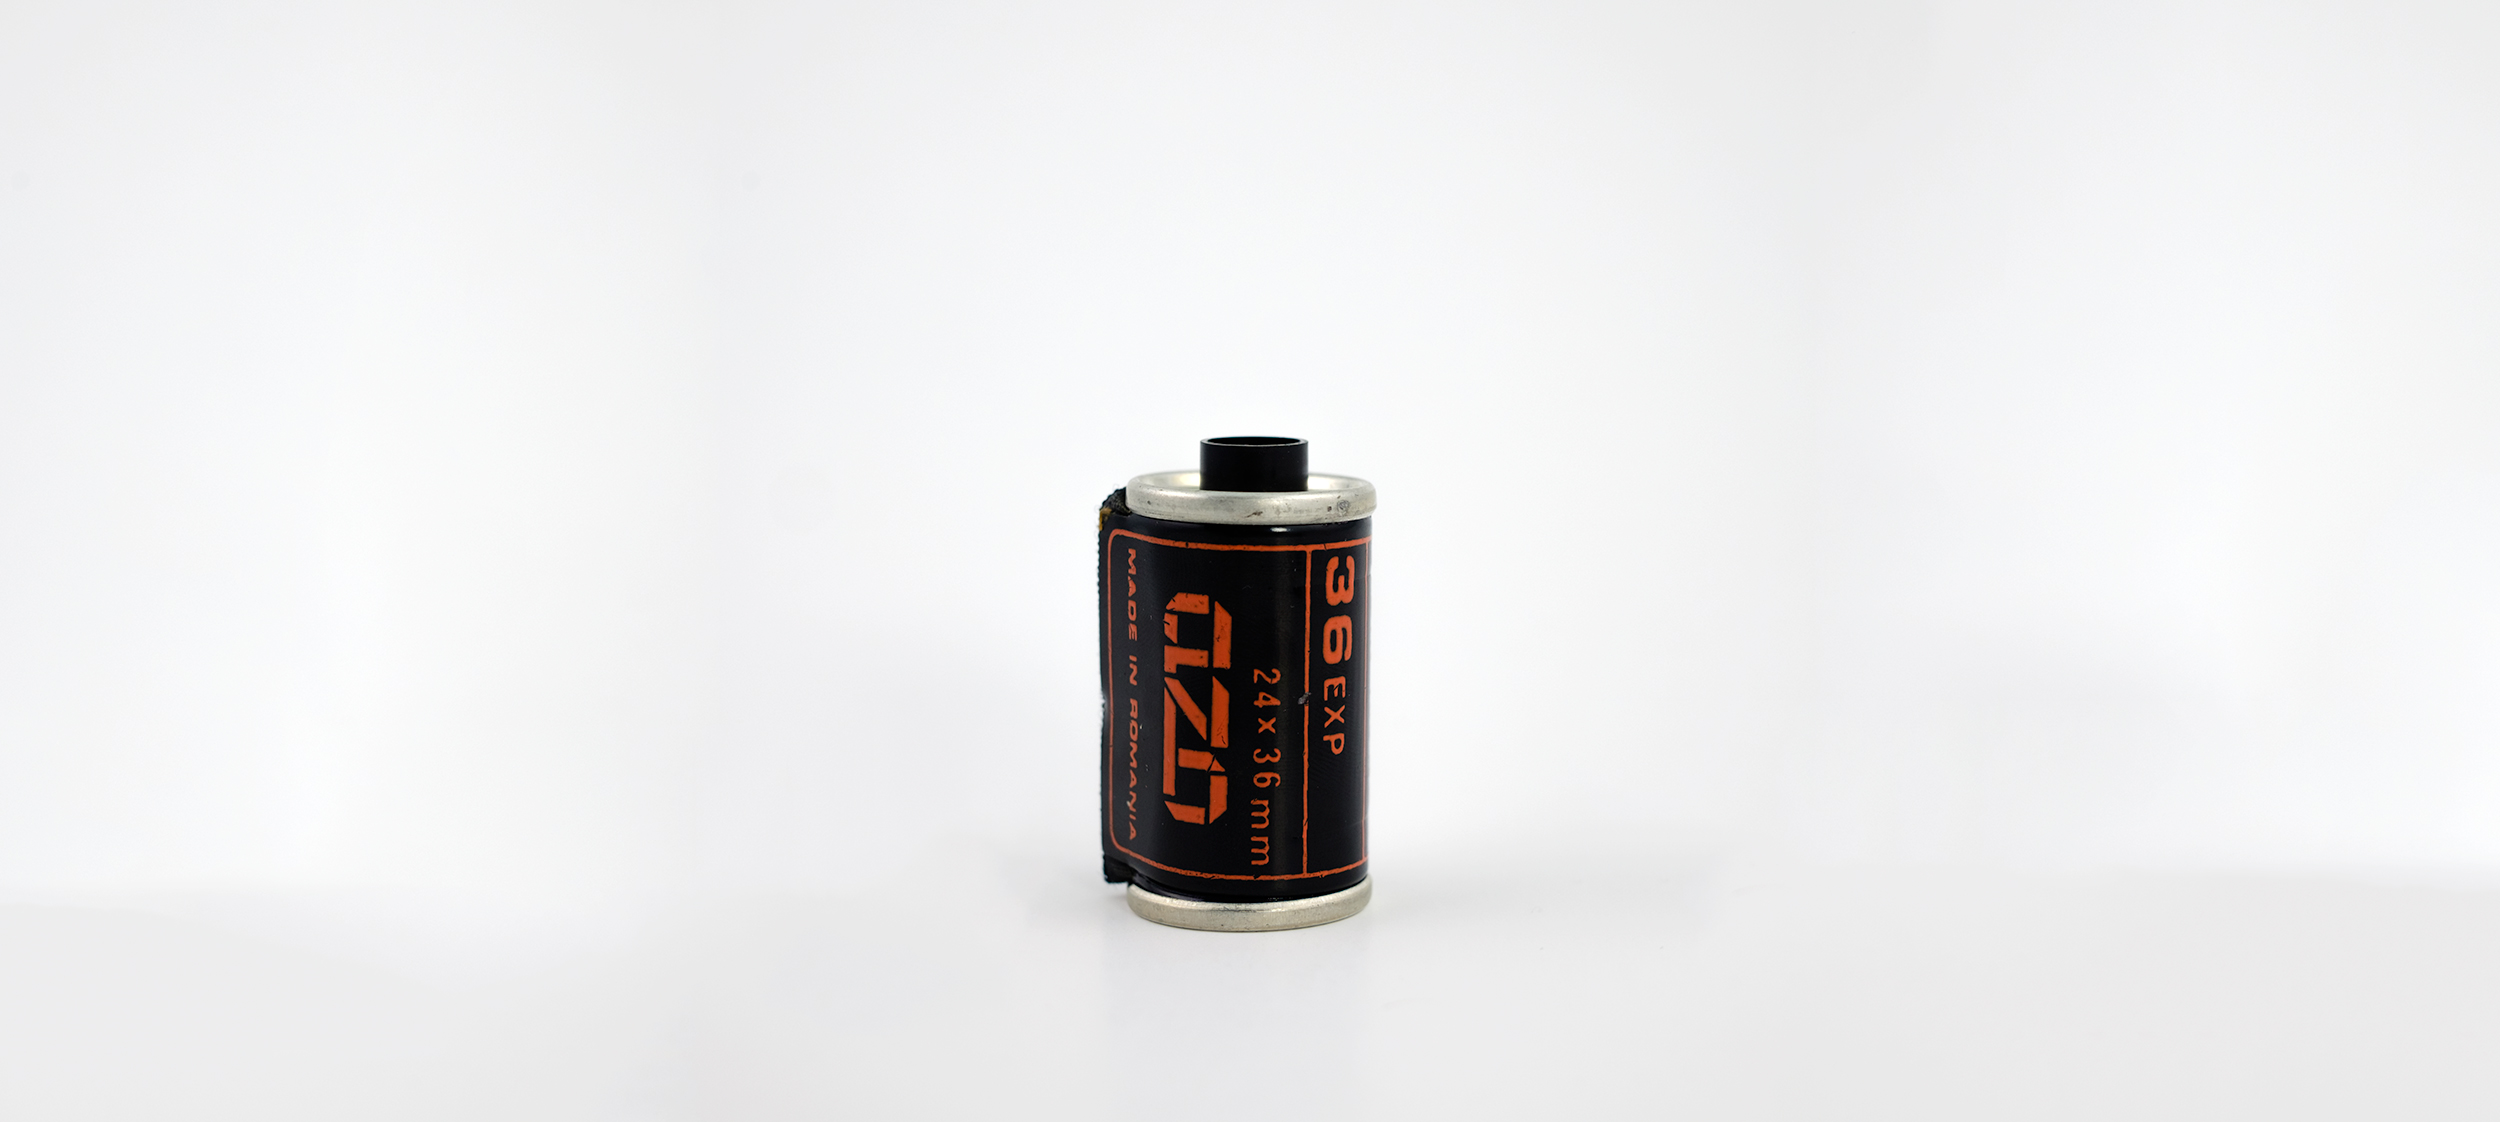 AZOPAN PS-21 Black and White Film